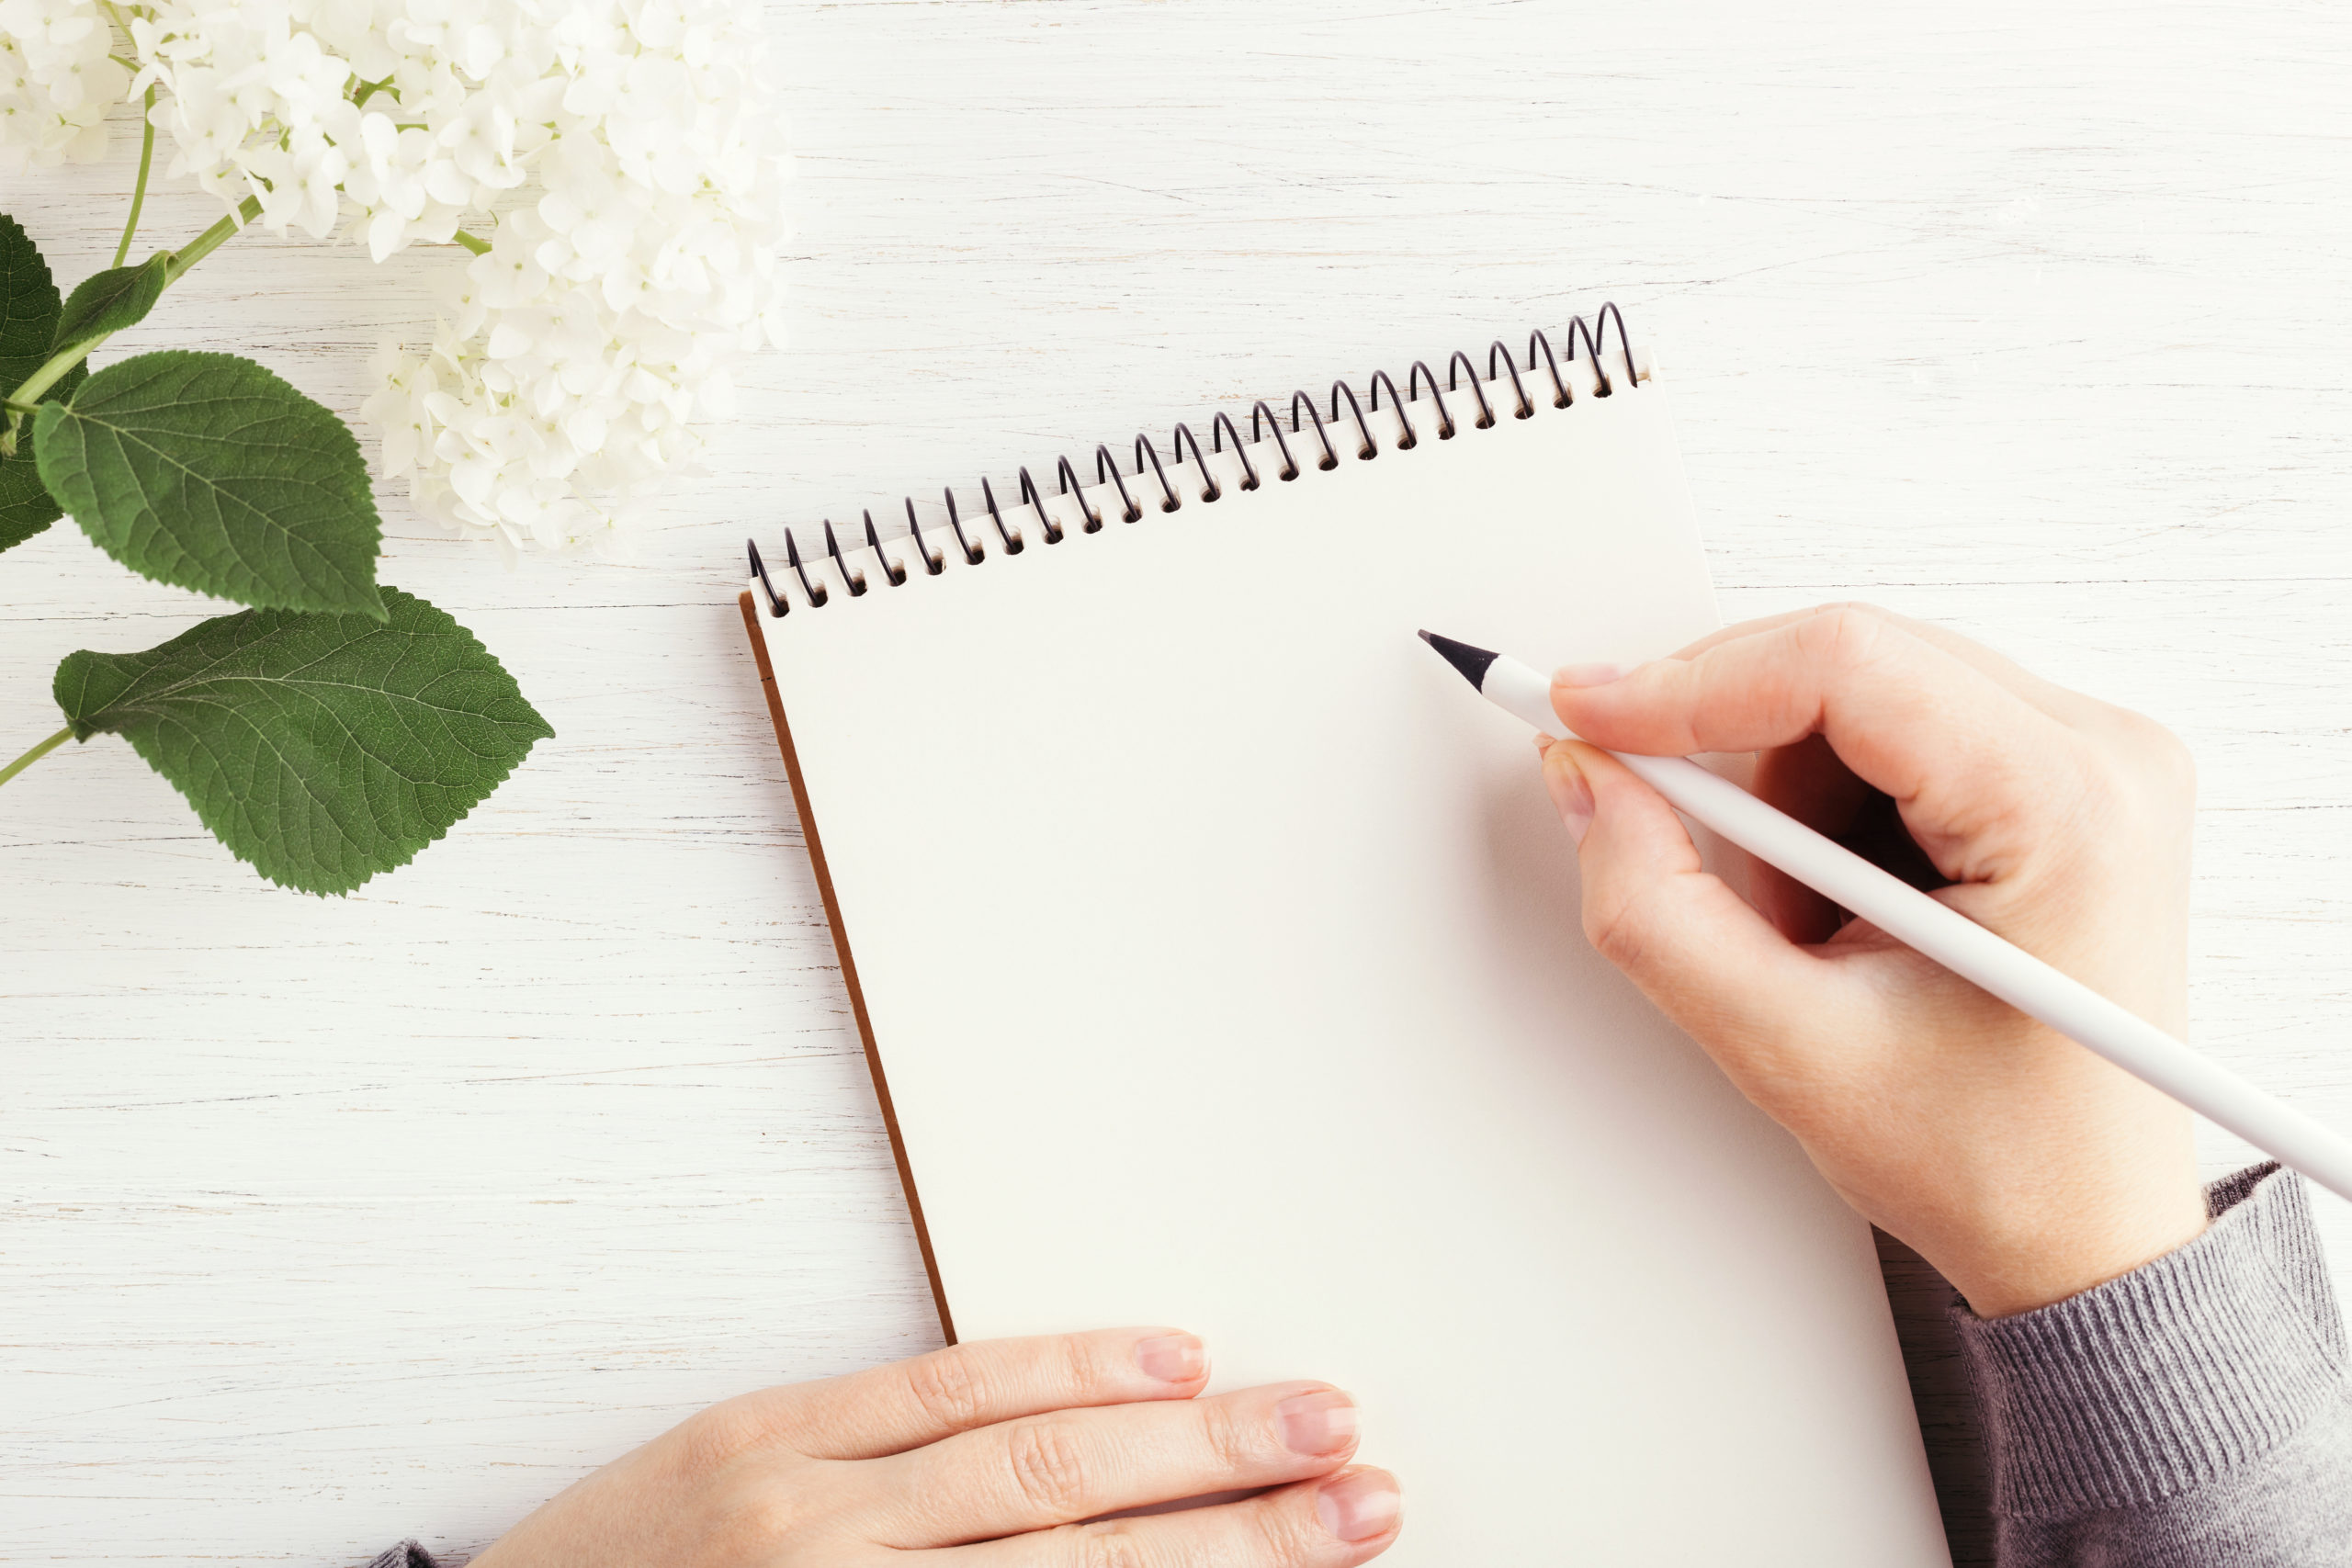 Descubre los beneficios de escribir a mano para tu mente